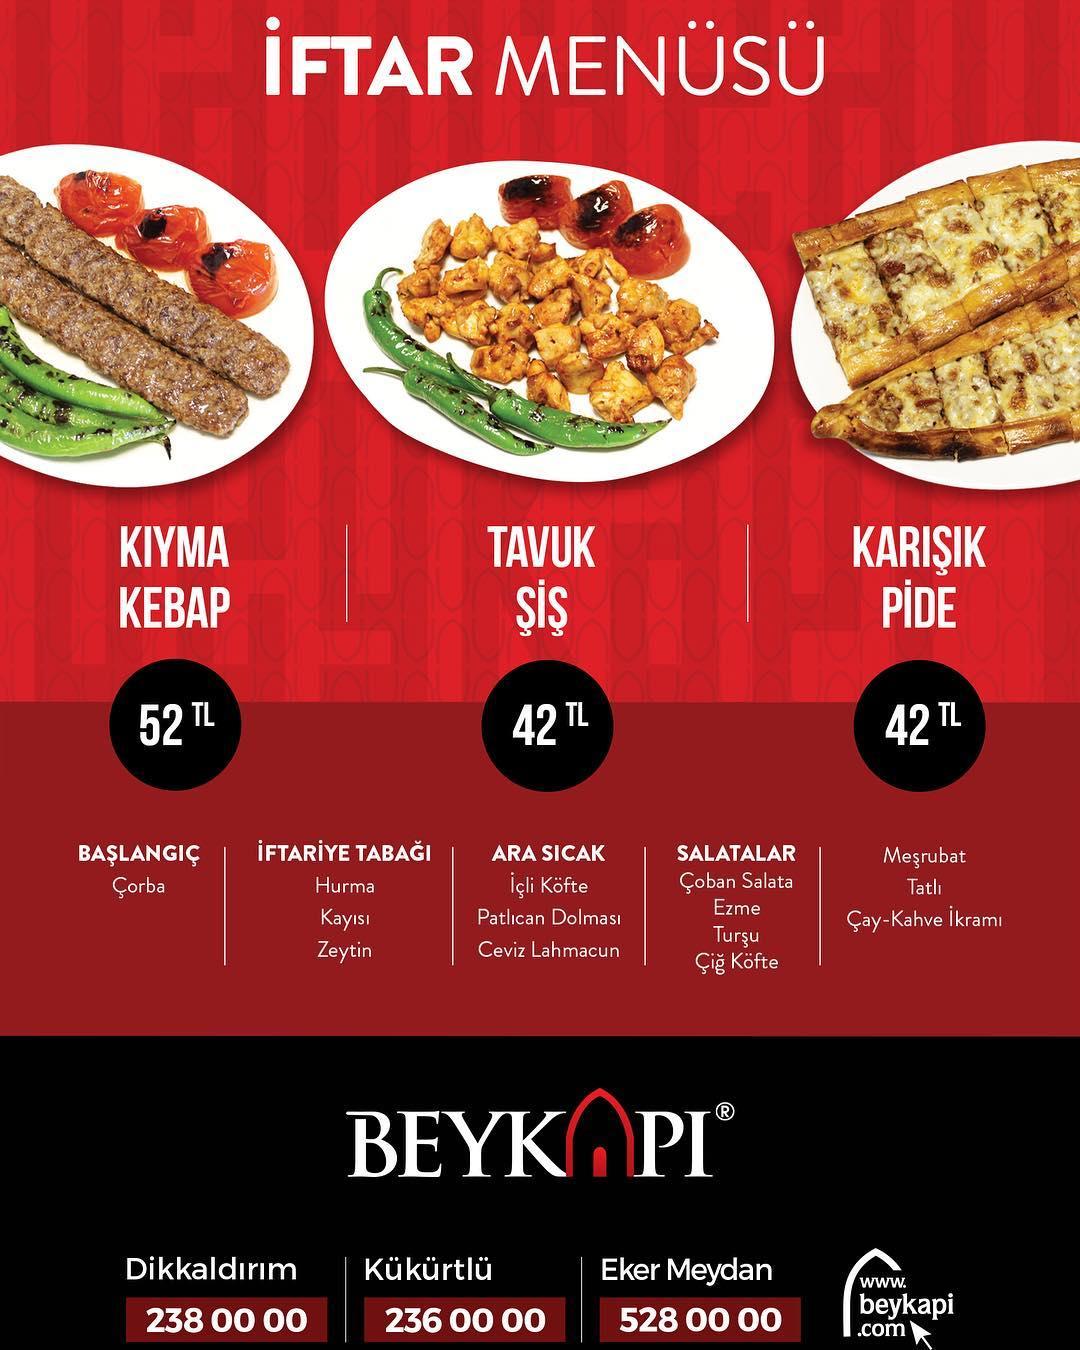 beykapı kebap bursa iftar menu fiyat